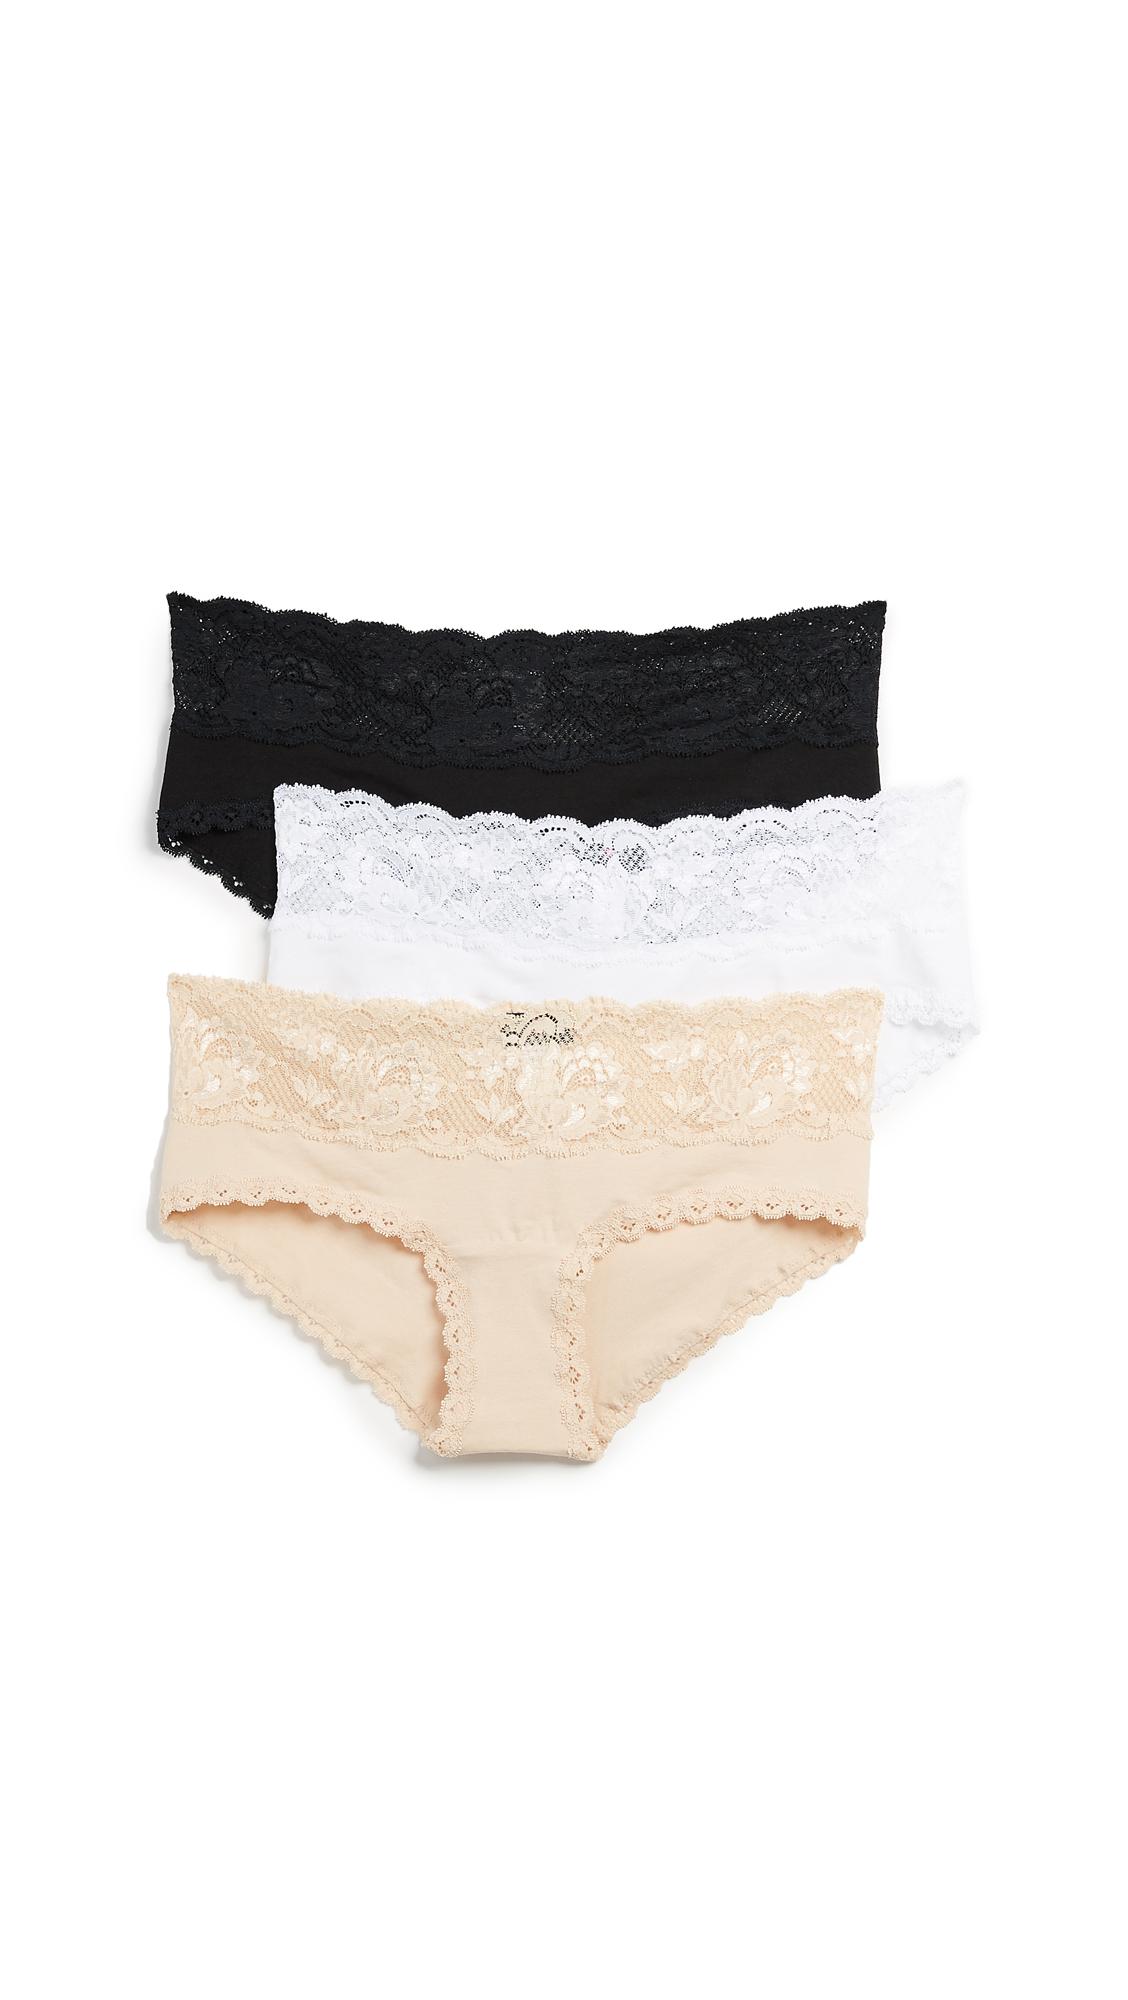 Cosabella Maternity Hotpant 3 Pack